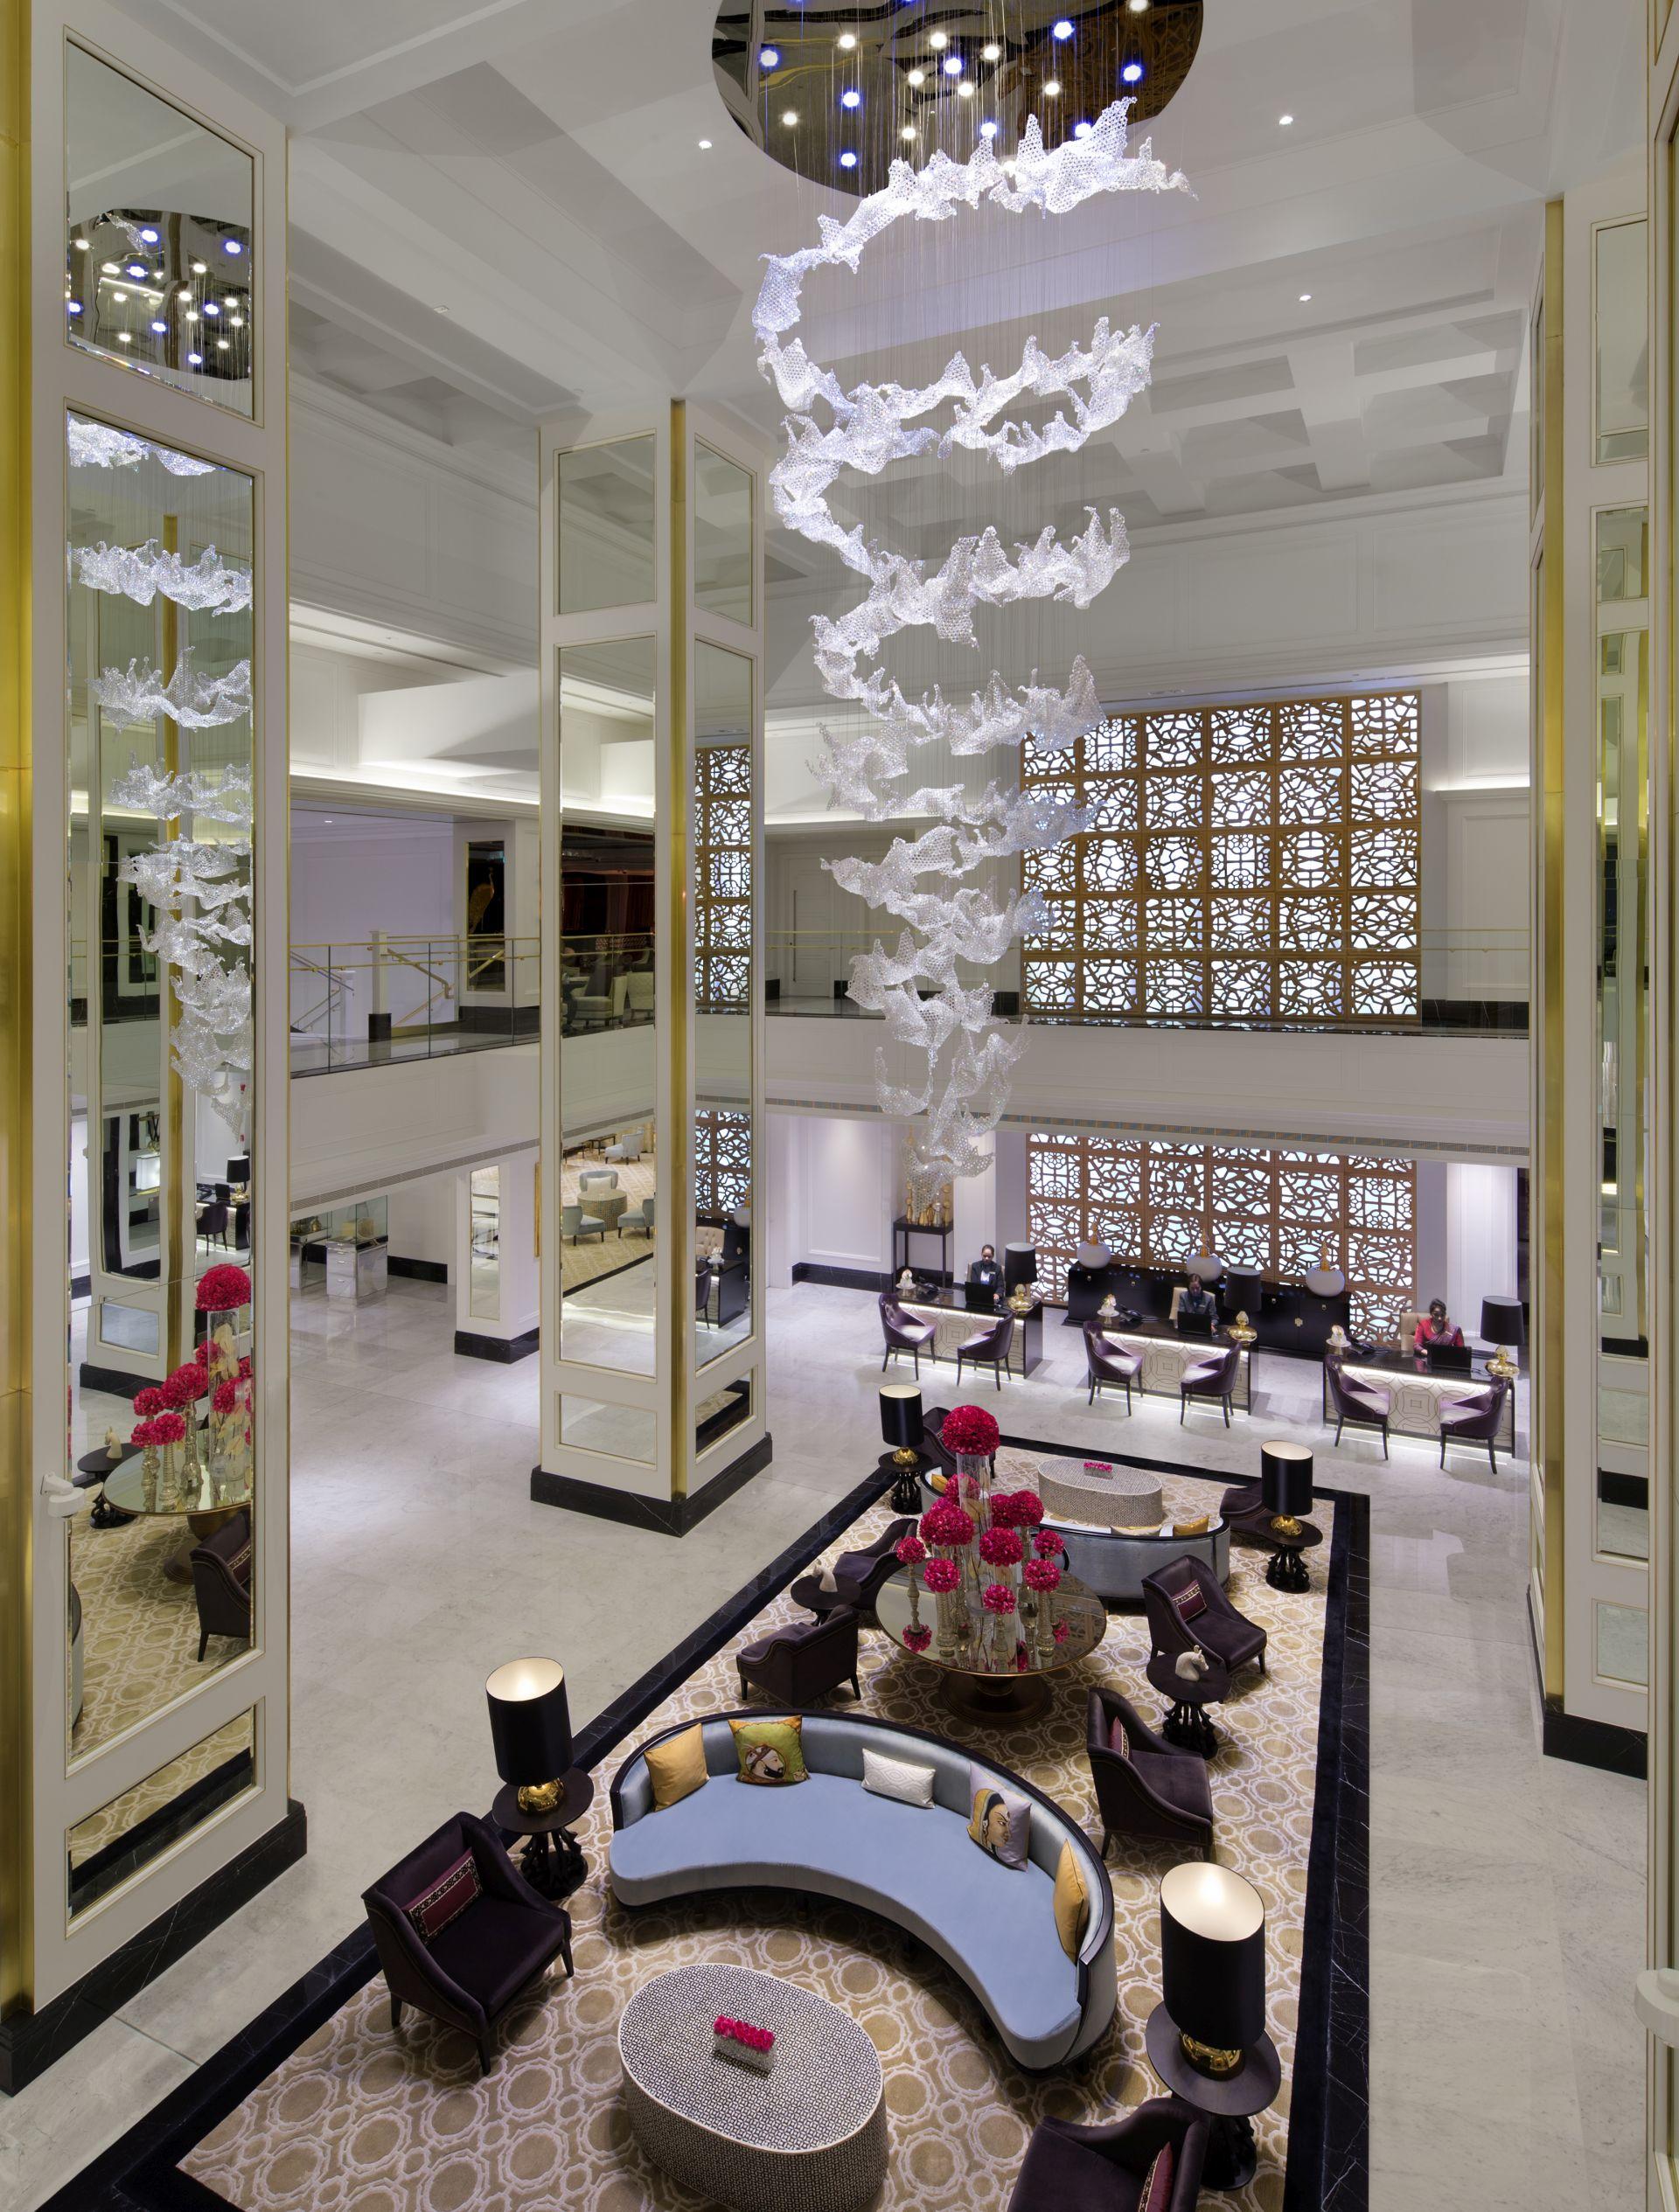 Hospitality designs taj dubai love that design for Design hotel dubai